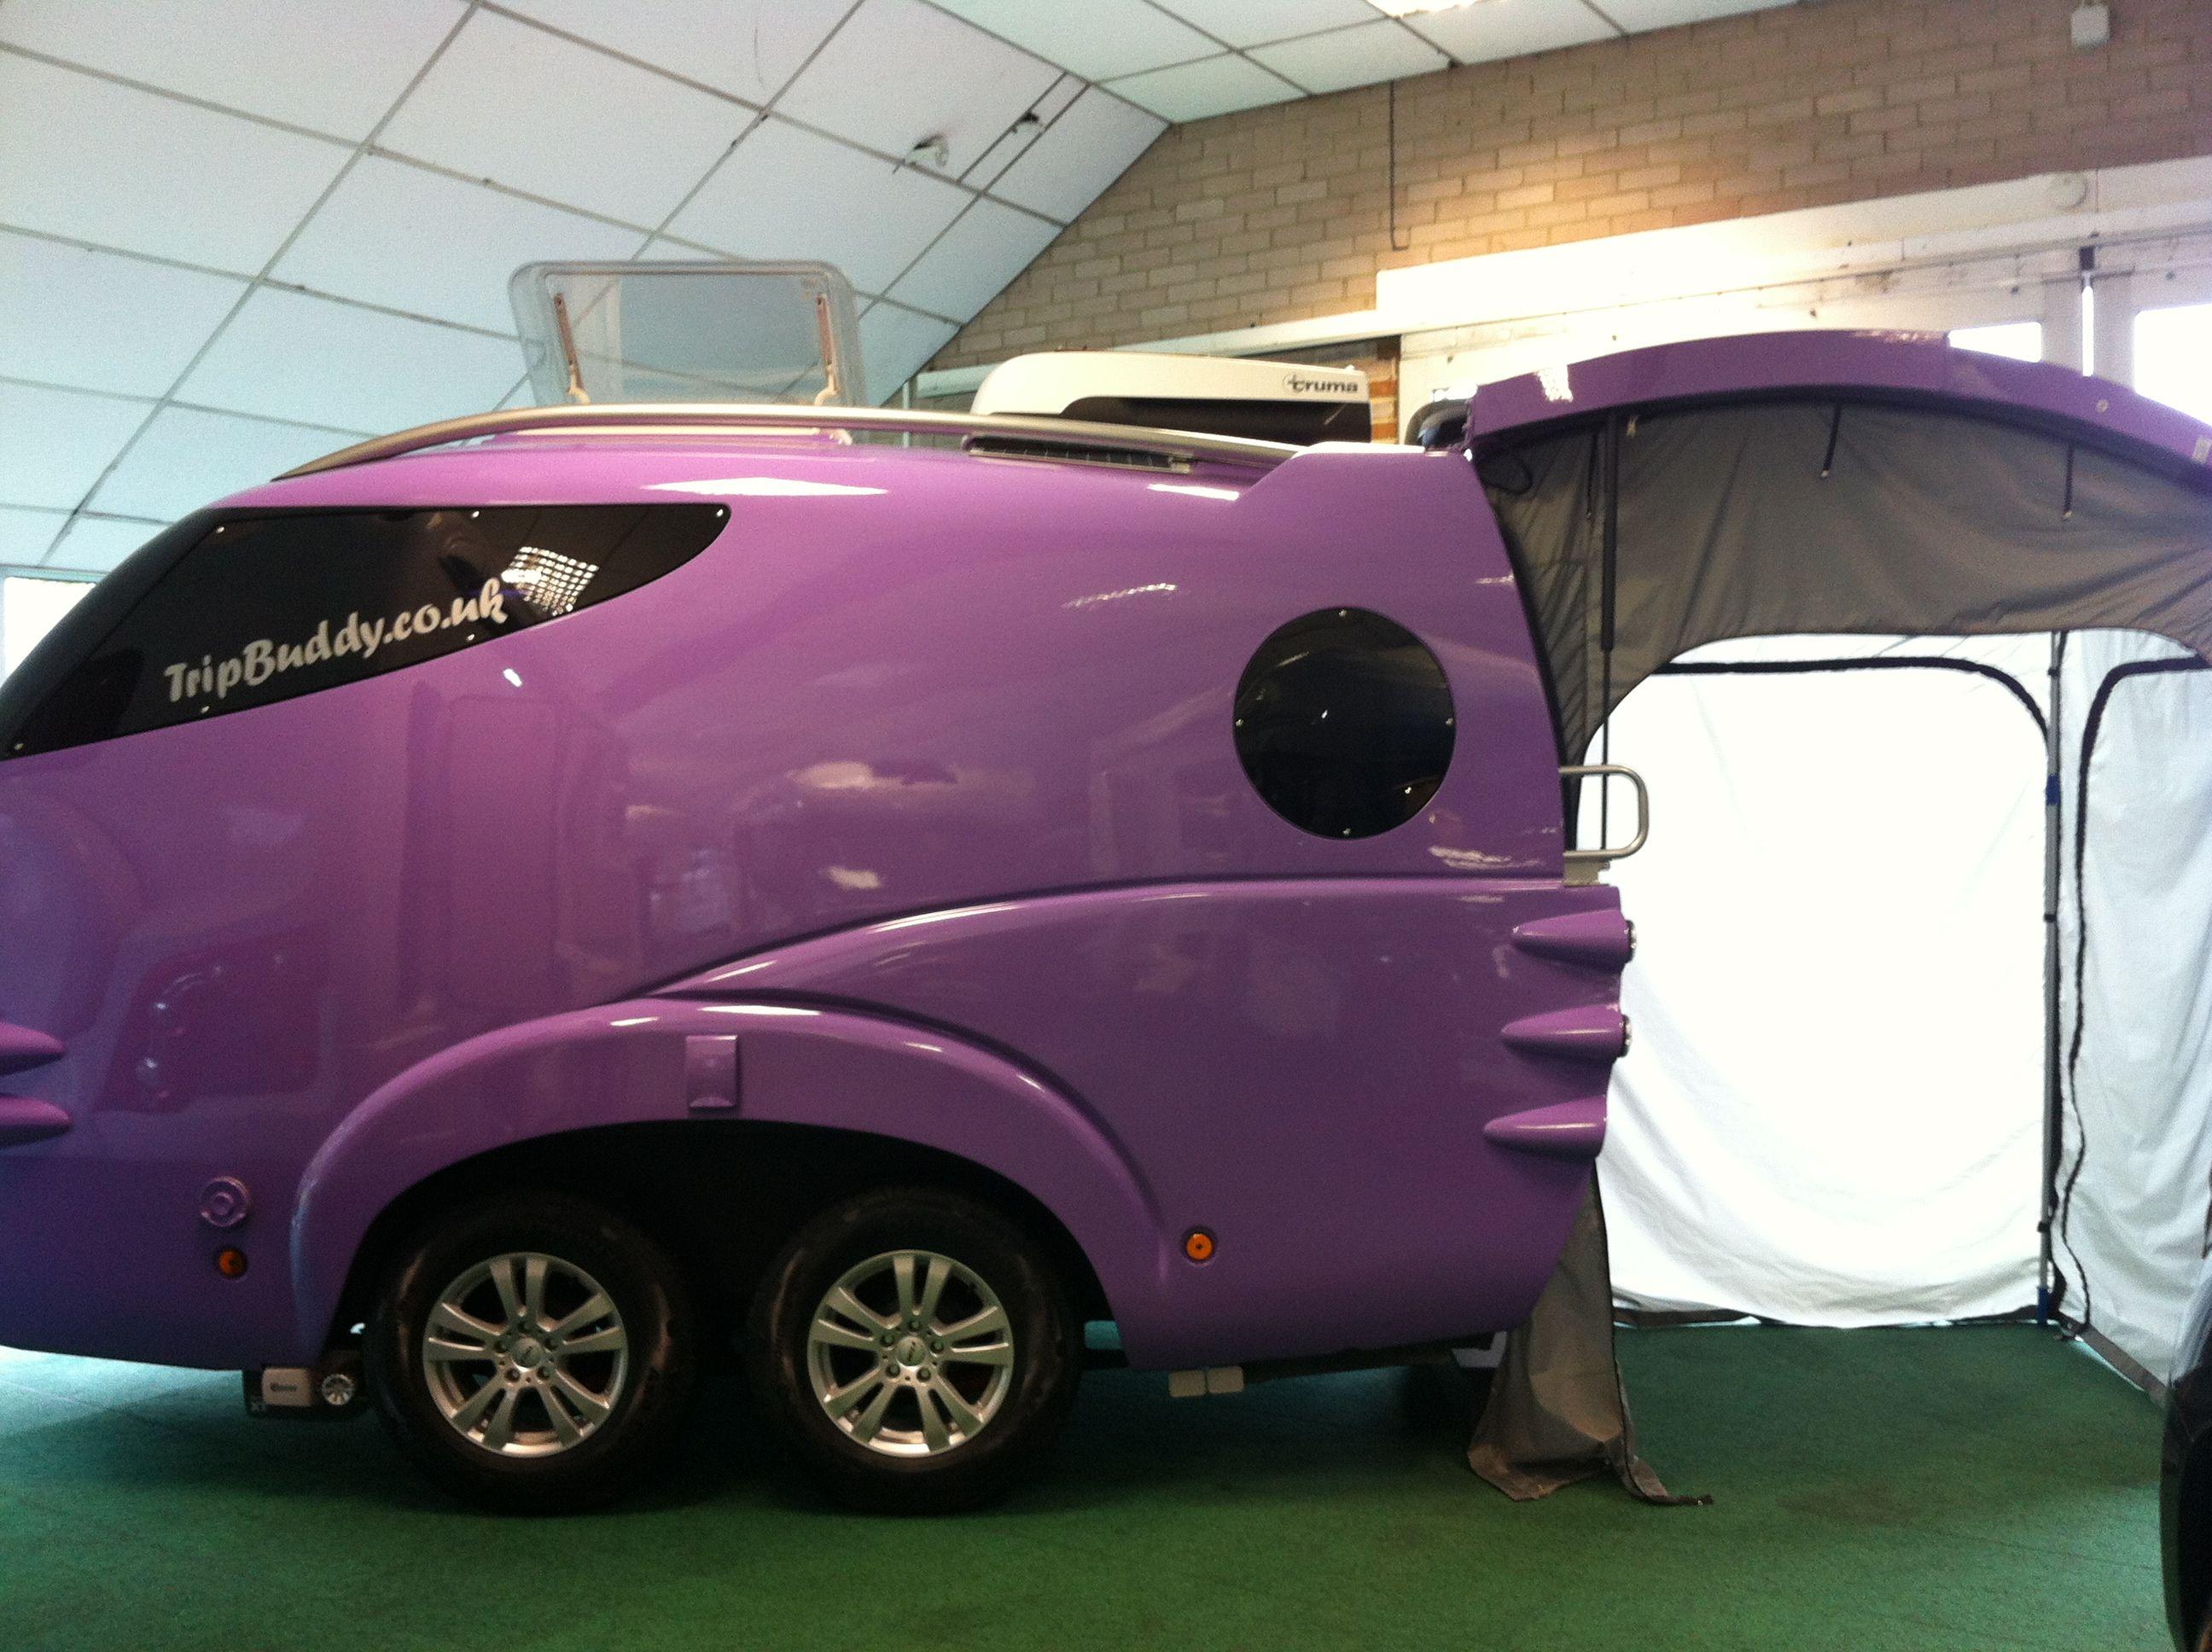 Tripbuddy Trailer Design Caravan